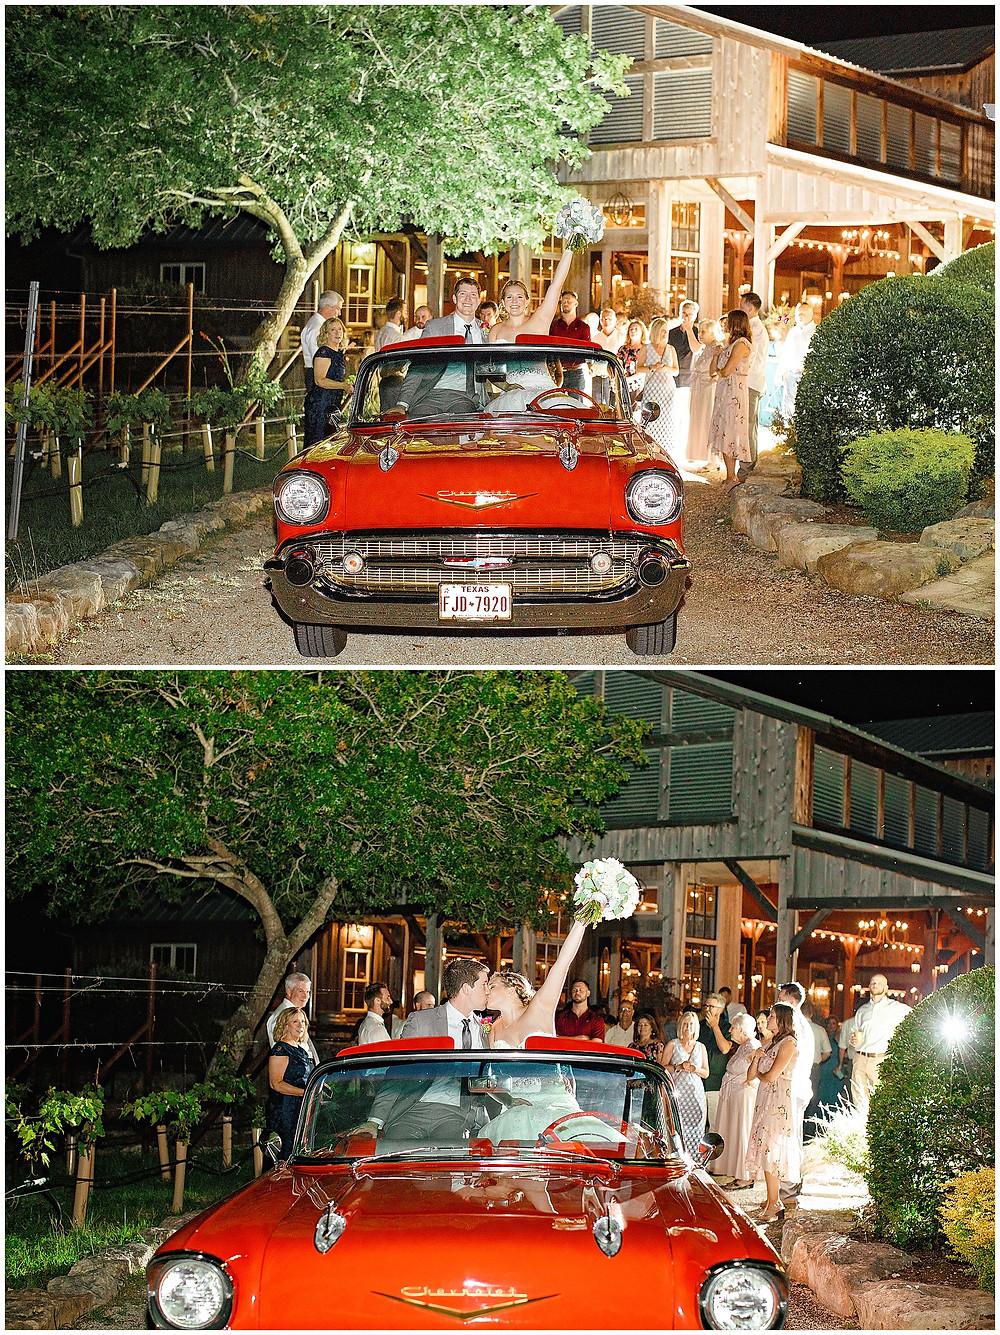 Boerne Wedding Photographer, San Antonio Wedding Photographer, Boerne Wedding Venue, Snap Chic Photography, Texas Hill Country Wedding, Riven Rock Ranch Wedding Venue, Comfort Texas Wedding Venue, Covid-19 Wedding | Vintage Getaway Car for Wedding